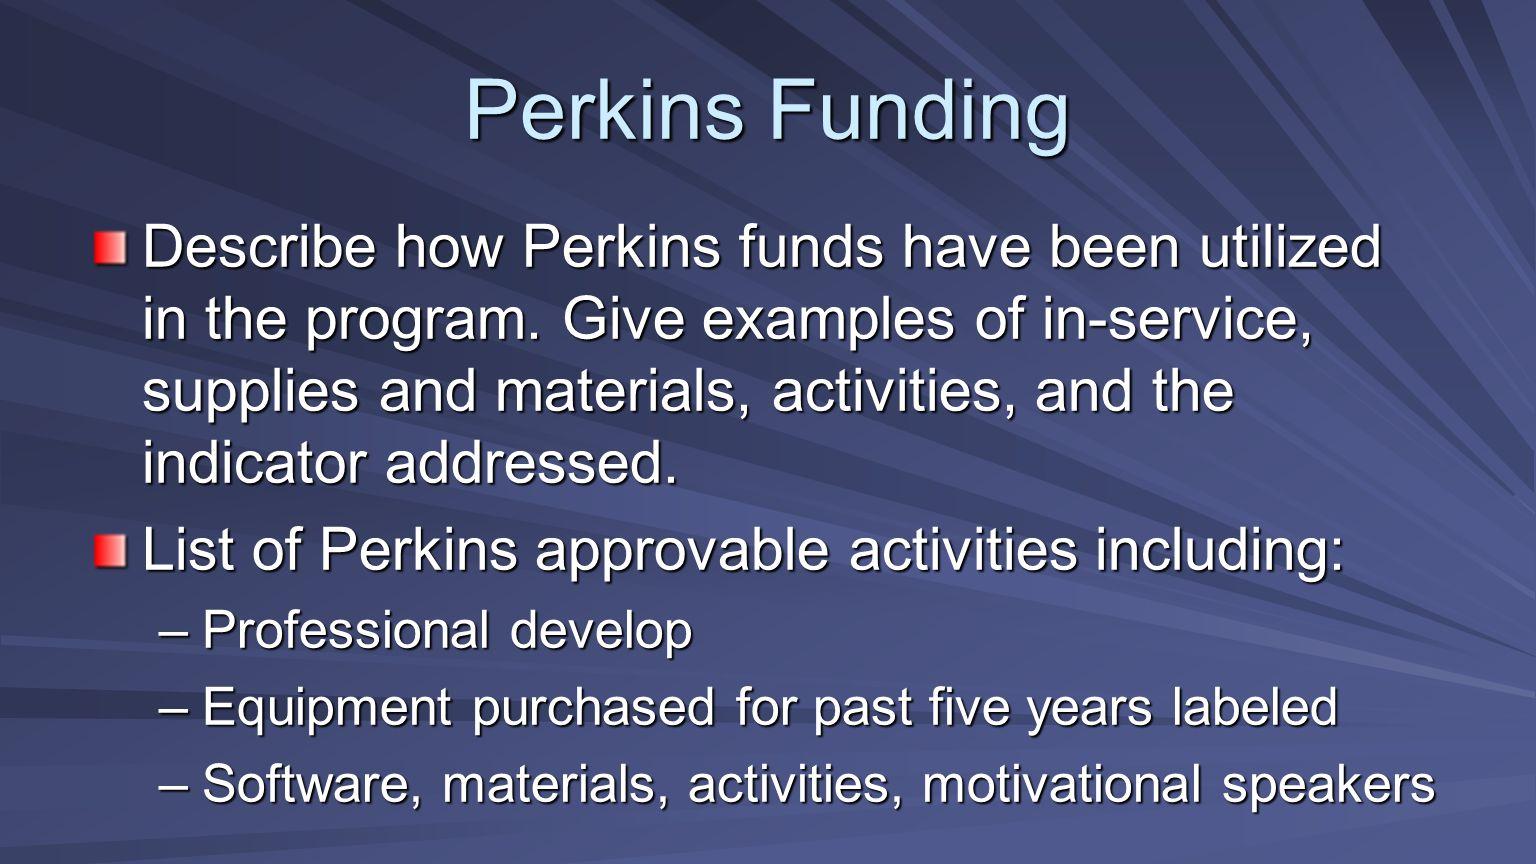 Perkins Funding